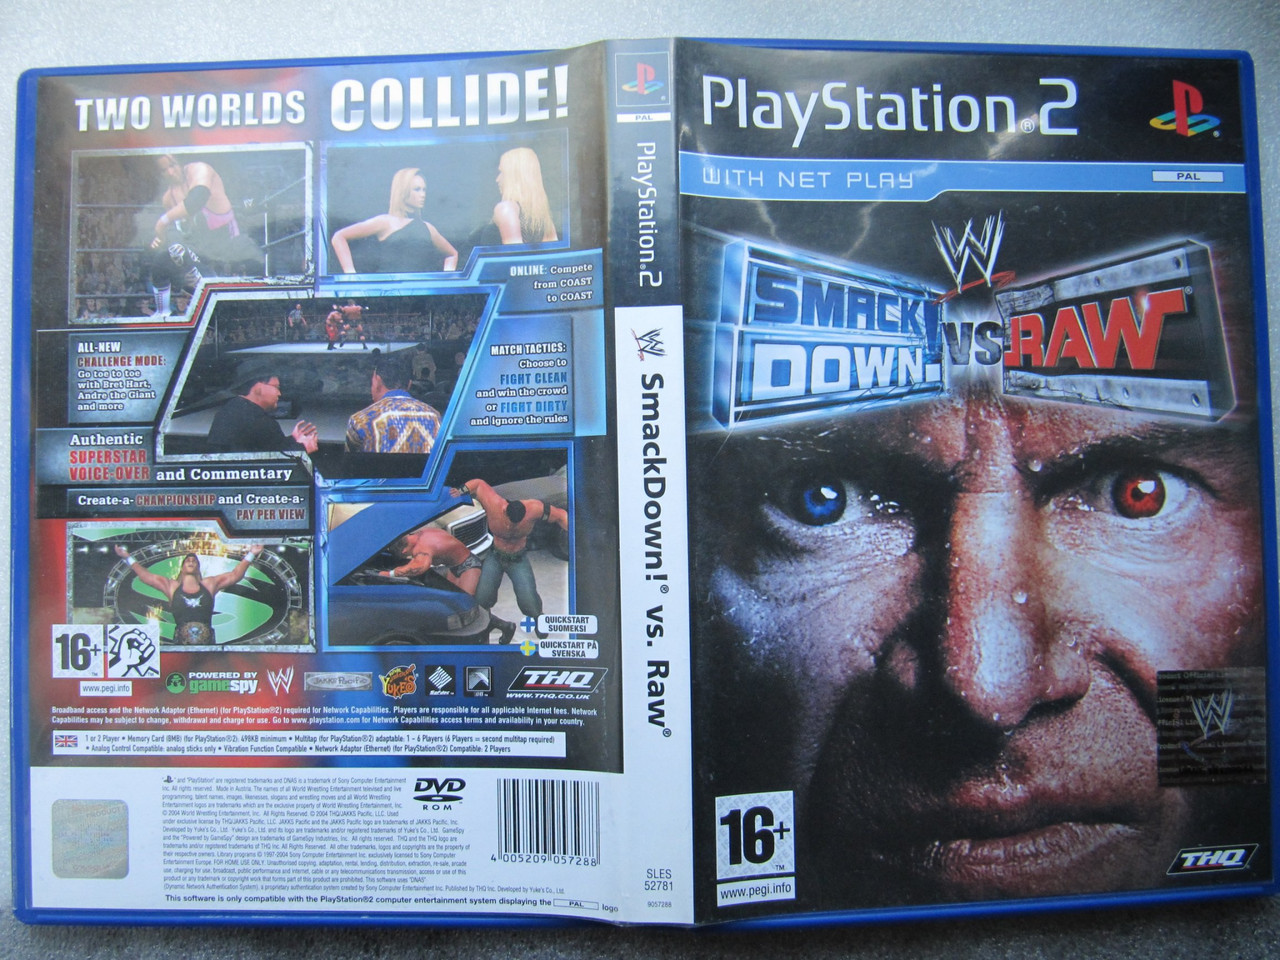 Playstation 2  Smackdown vs RAW